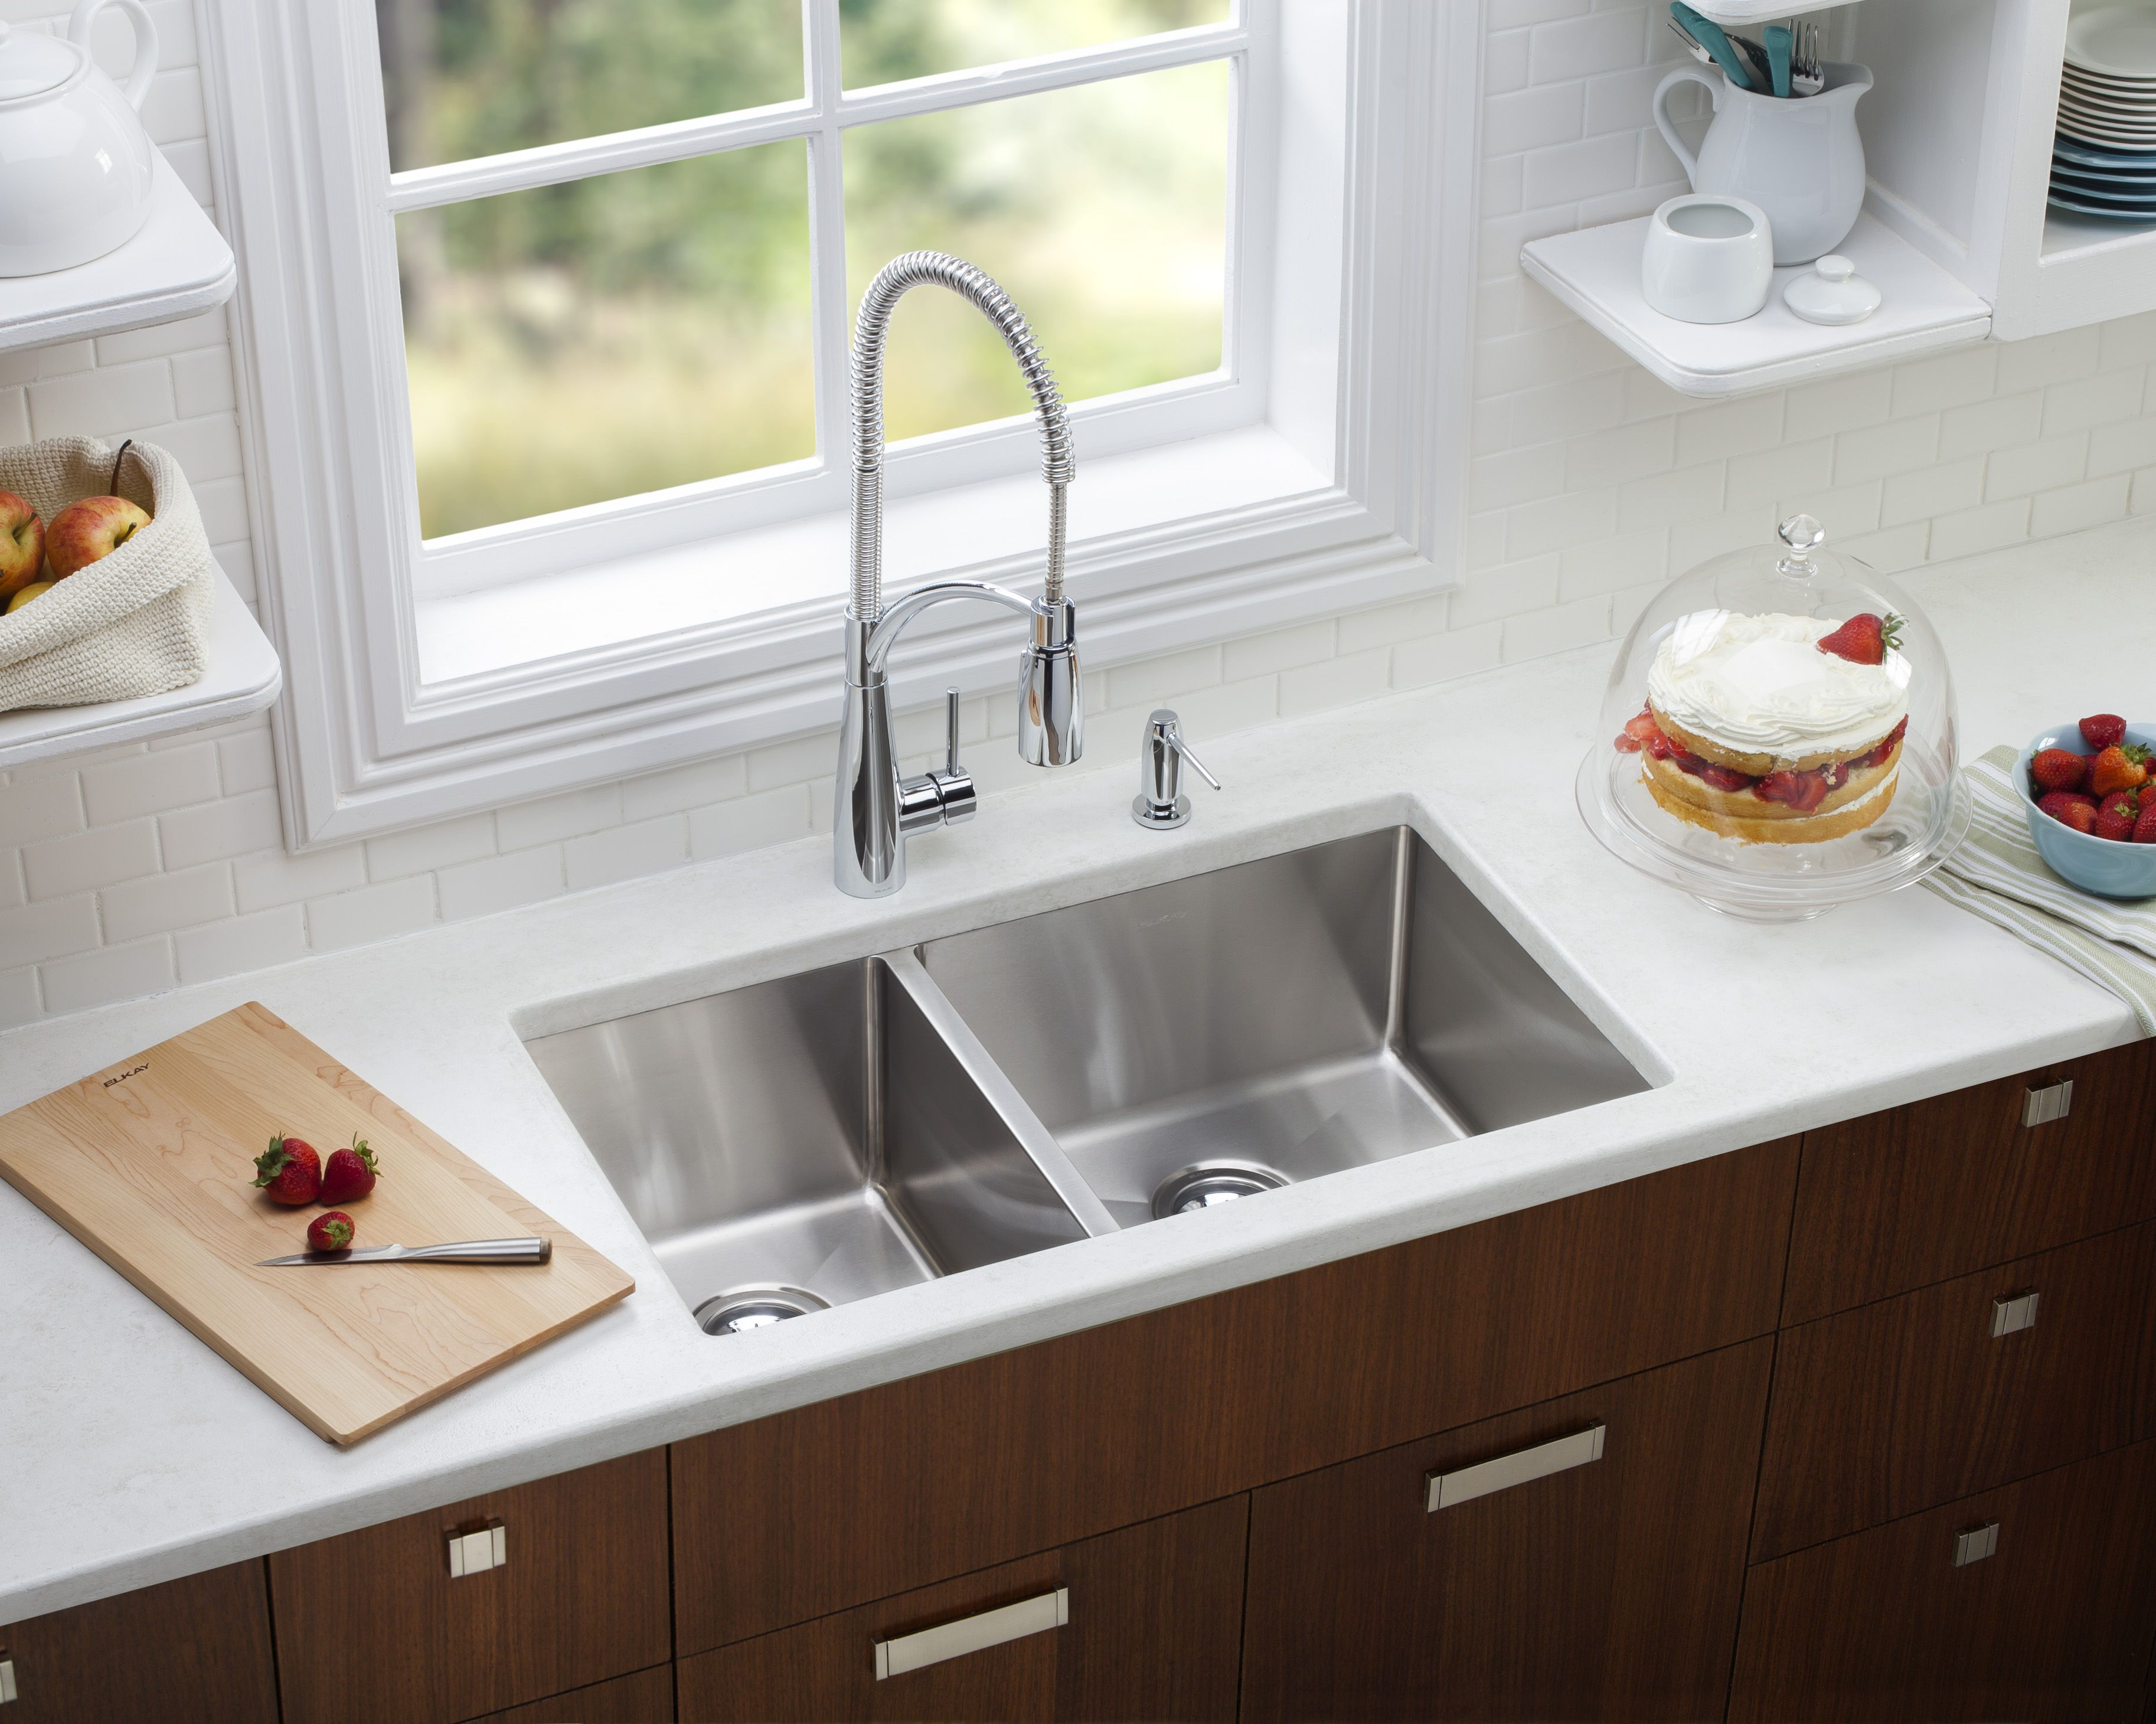 Elkay Crosstown stainless steel double bowl undermount sink ...